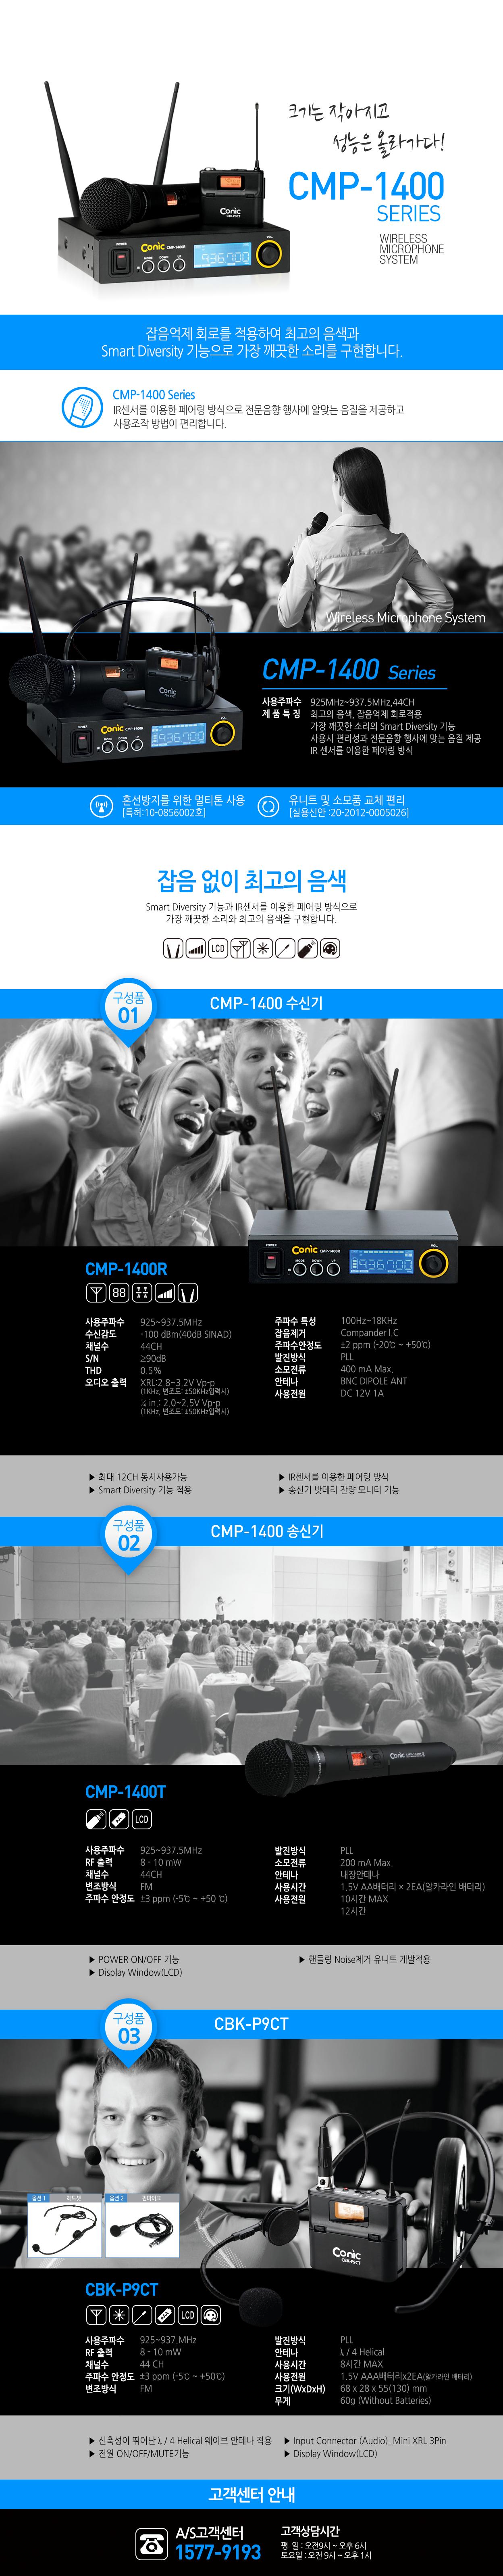 CMP-1400_20190920.png